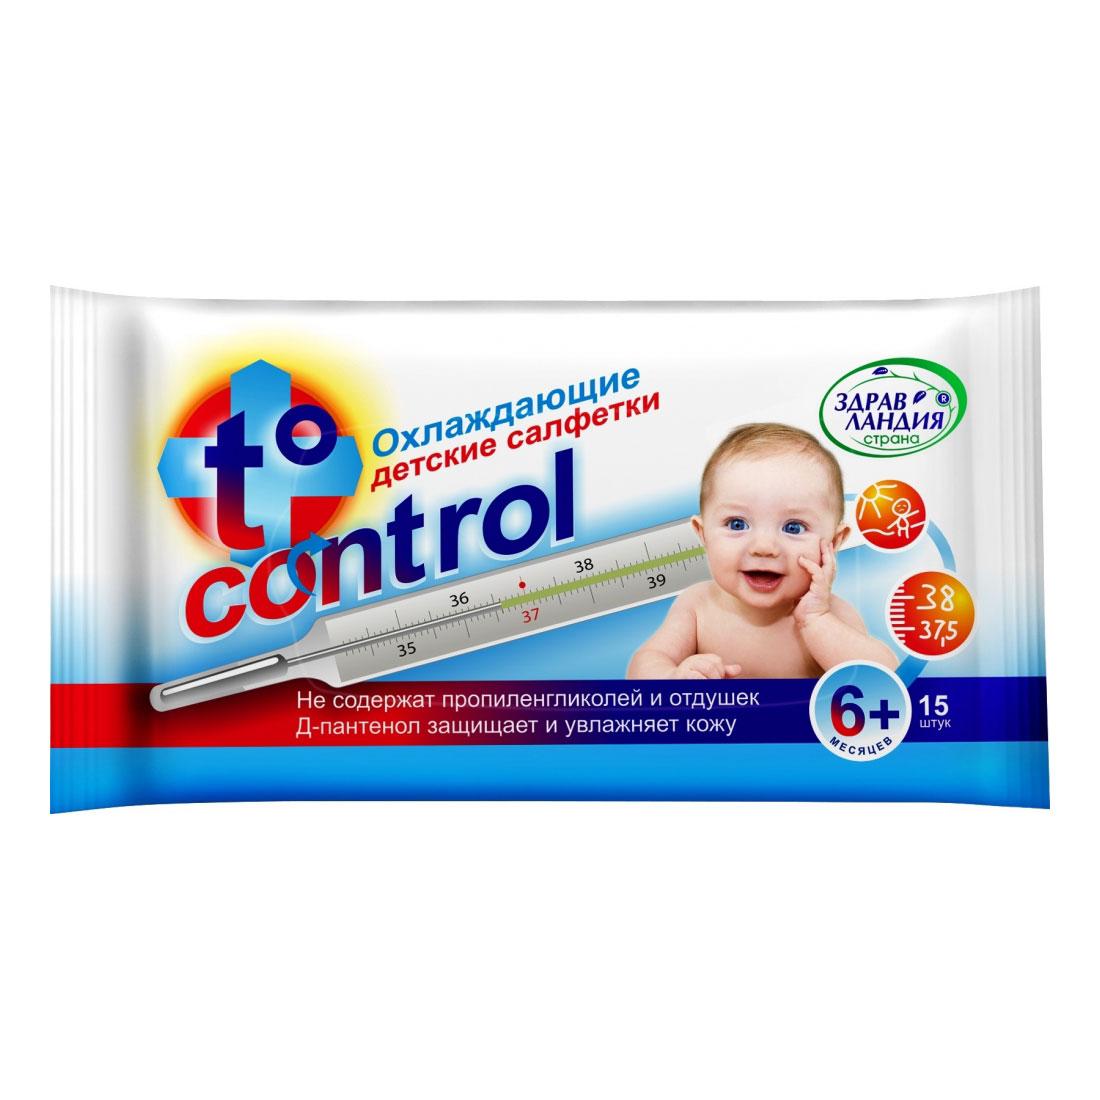 �������� ������� ������ ����������� T-control ����������� (� 6 ���) 15 ��